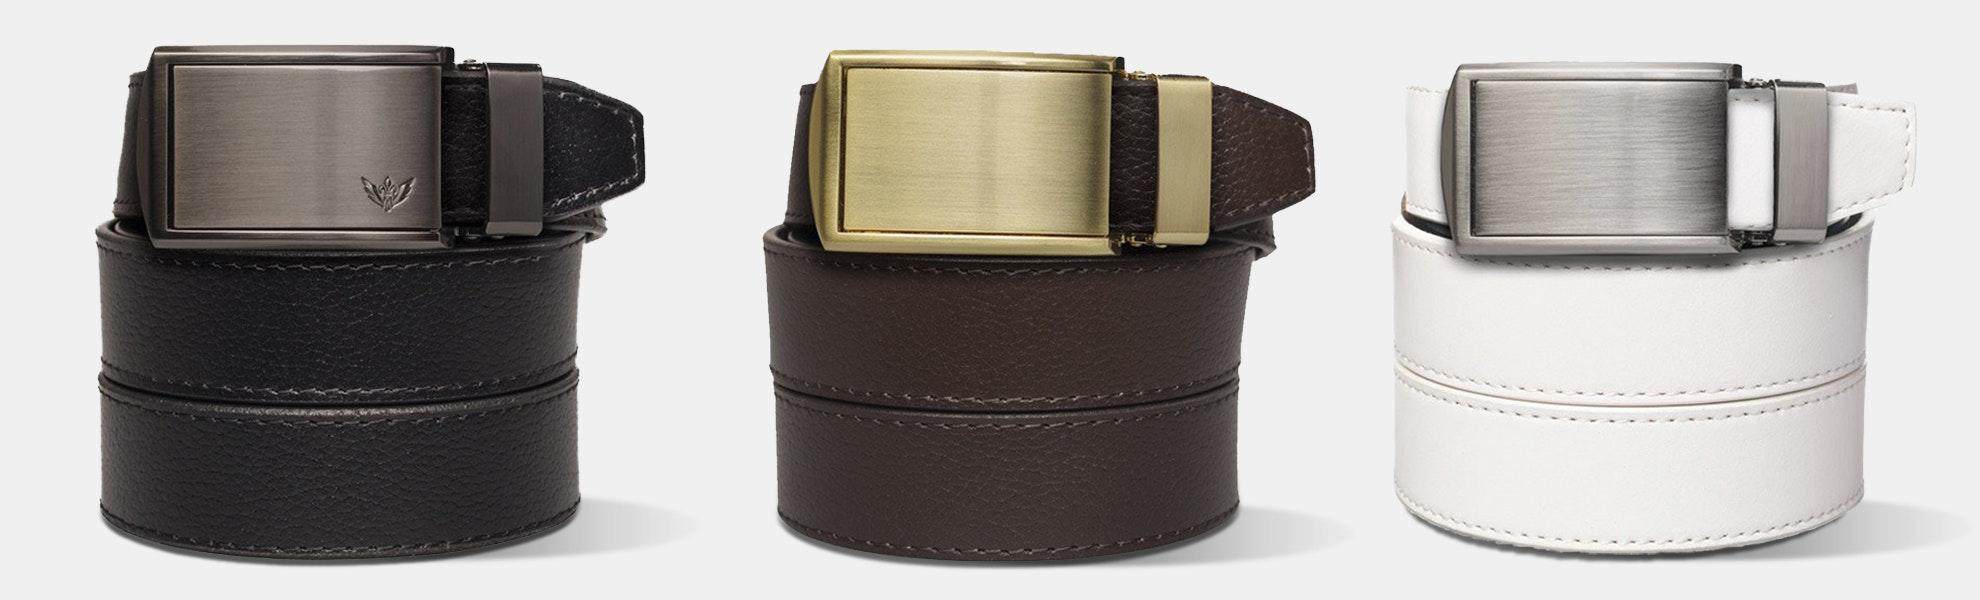 SlideBelts Ratchet Belts: Classic Collection